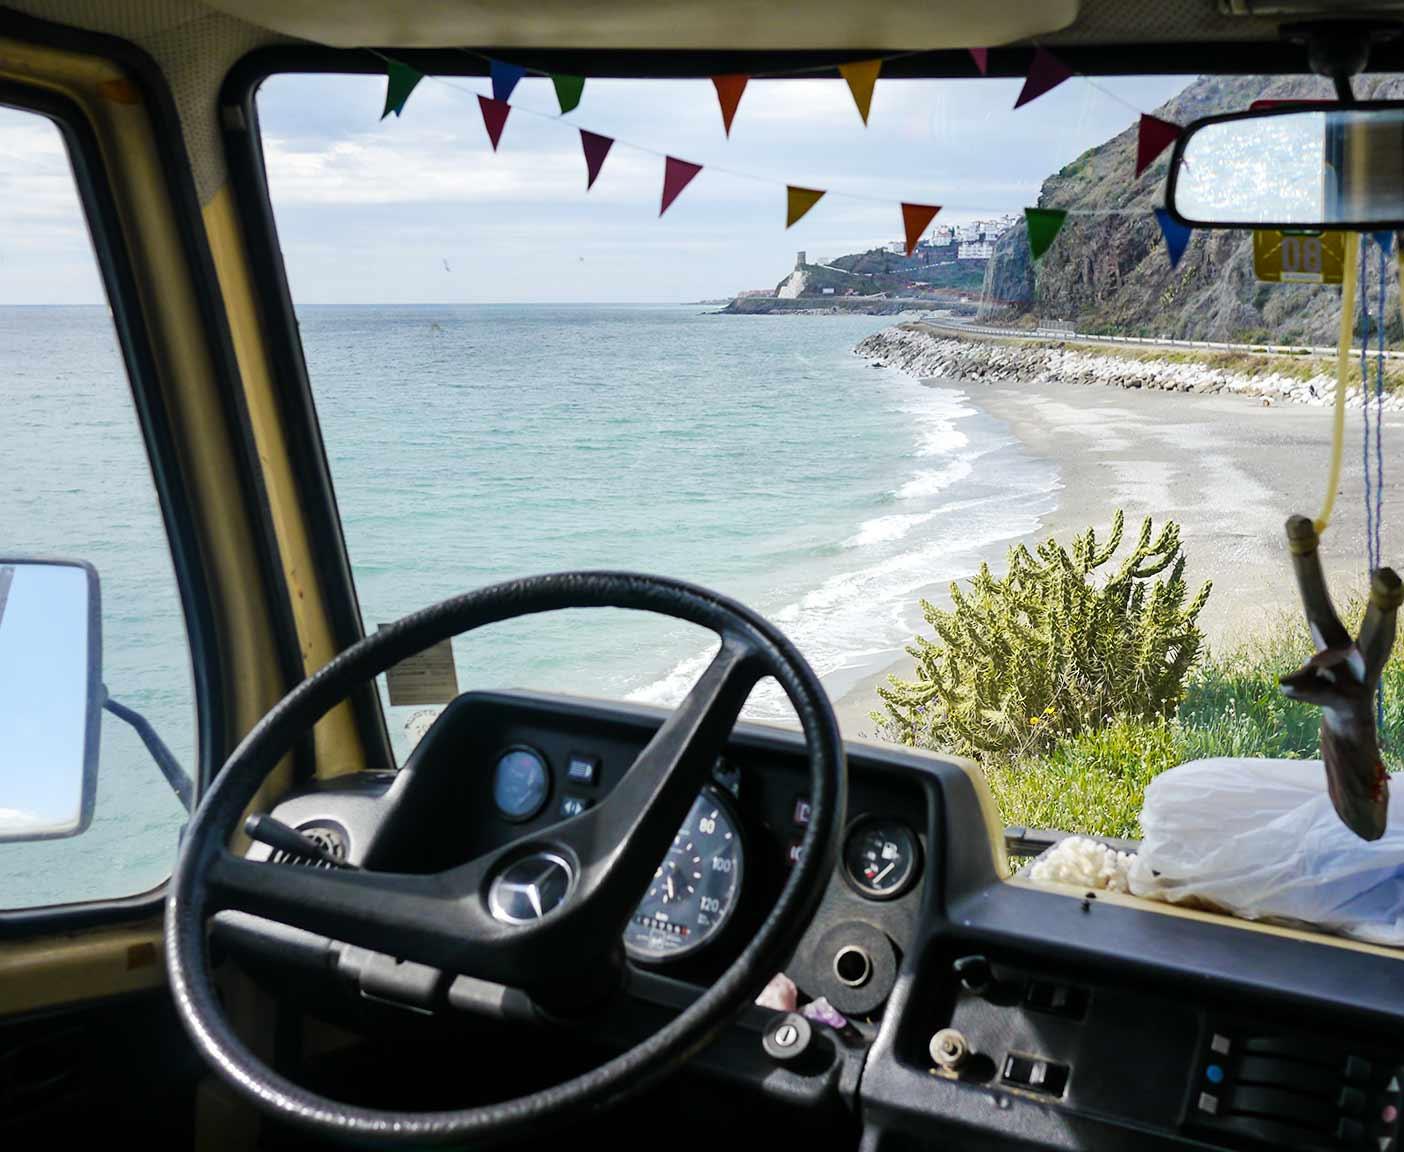 Ausblick aus dem Fahrerraum auf Meer und Kueste Lenkrad Steuer Mercedes